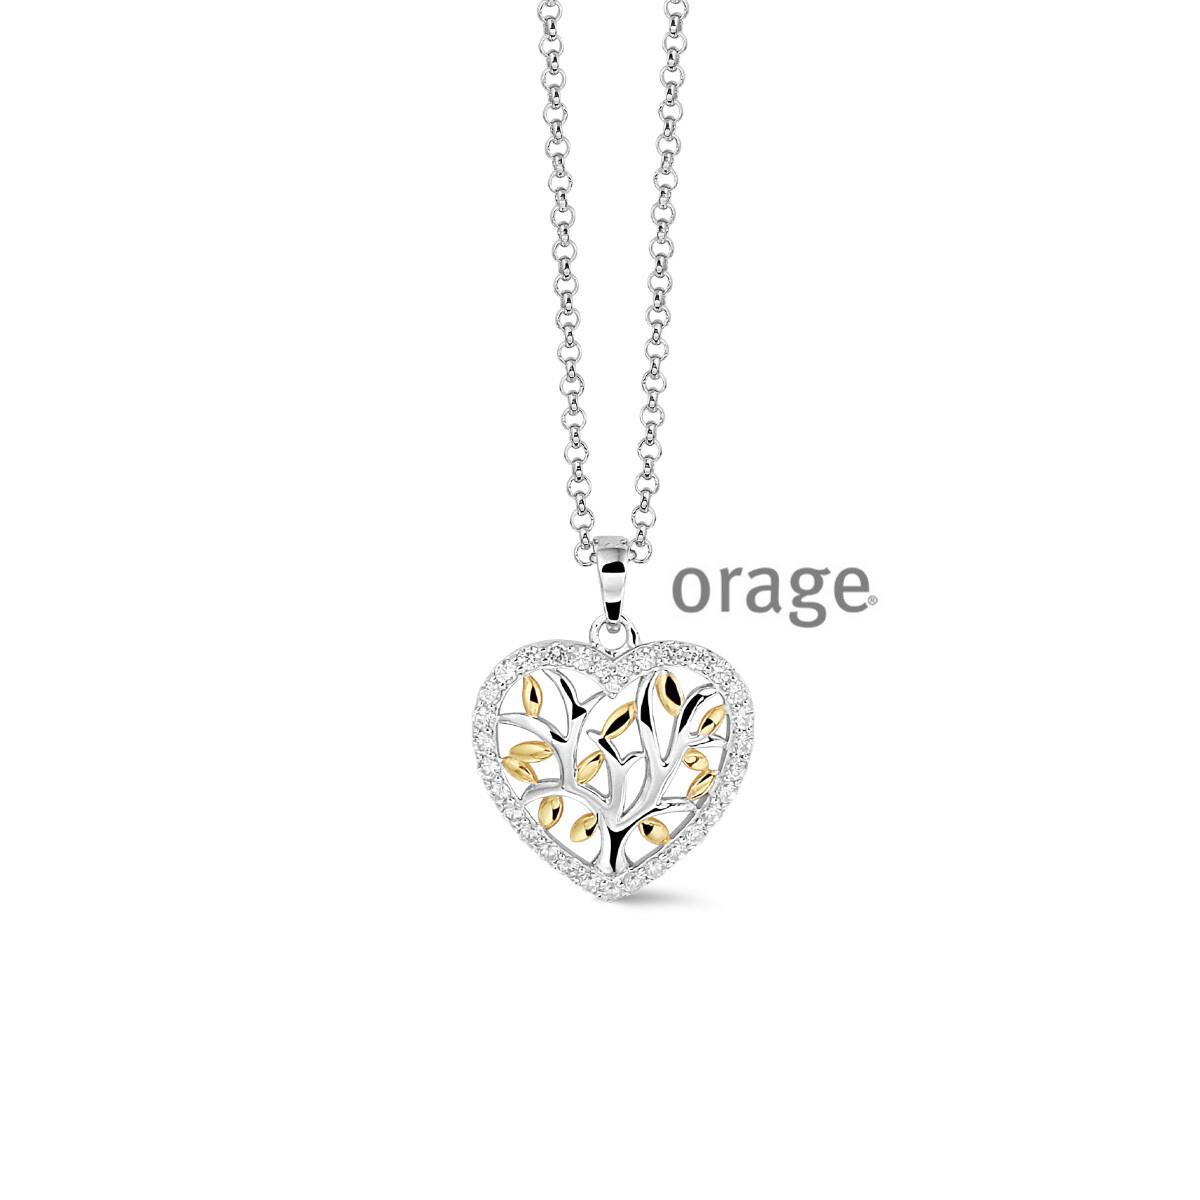 Collier Orage V1402